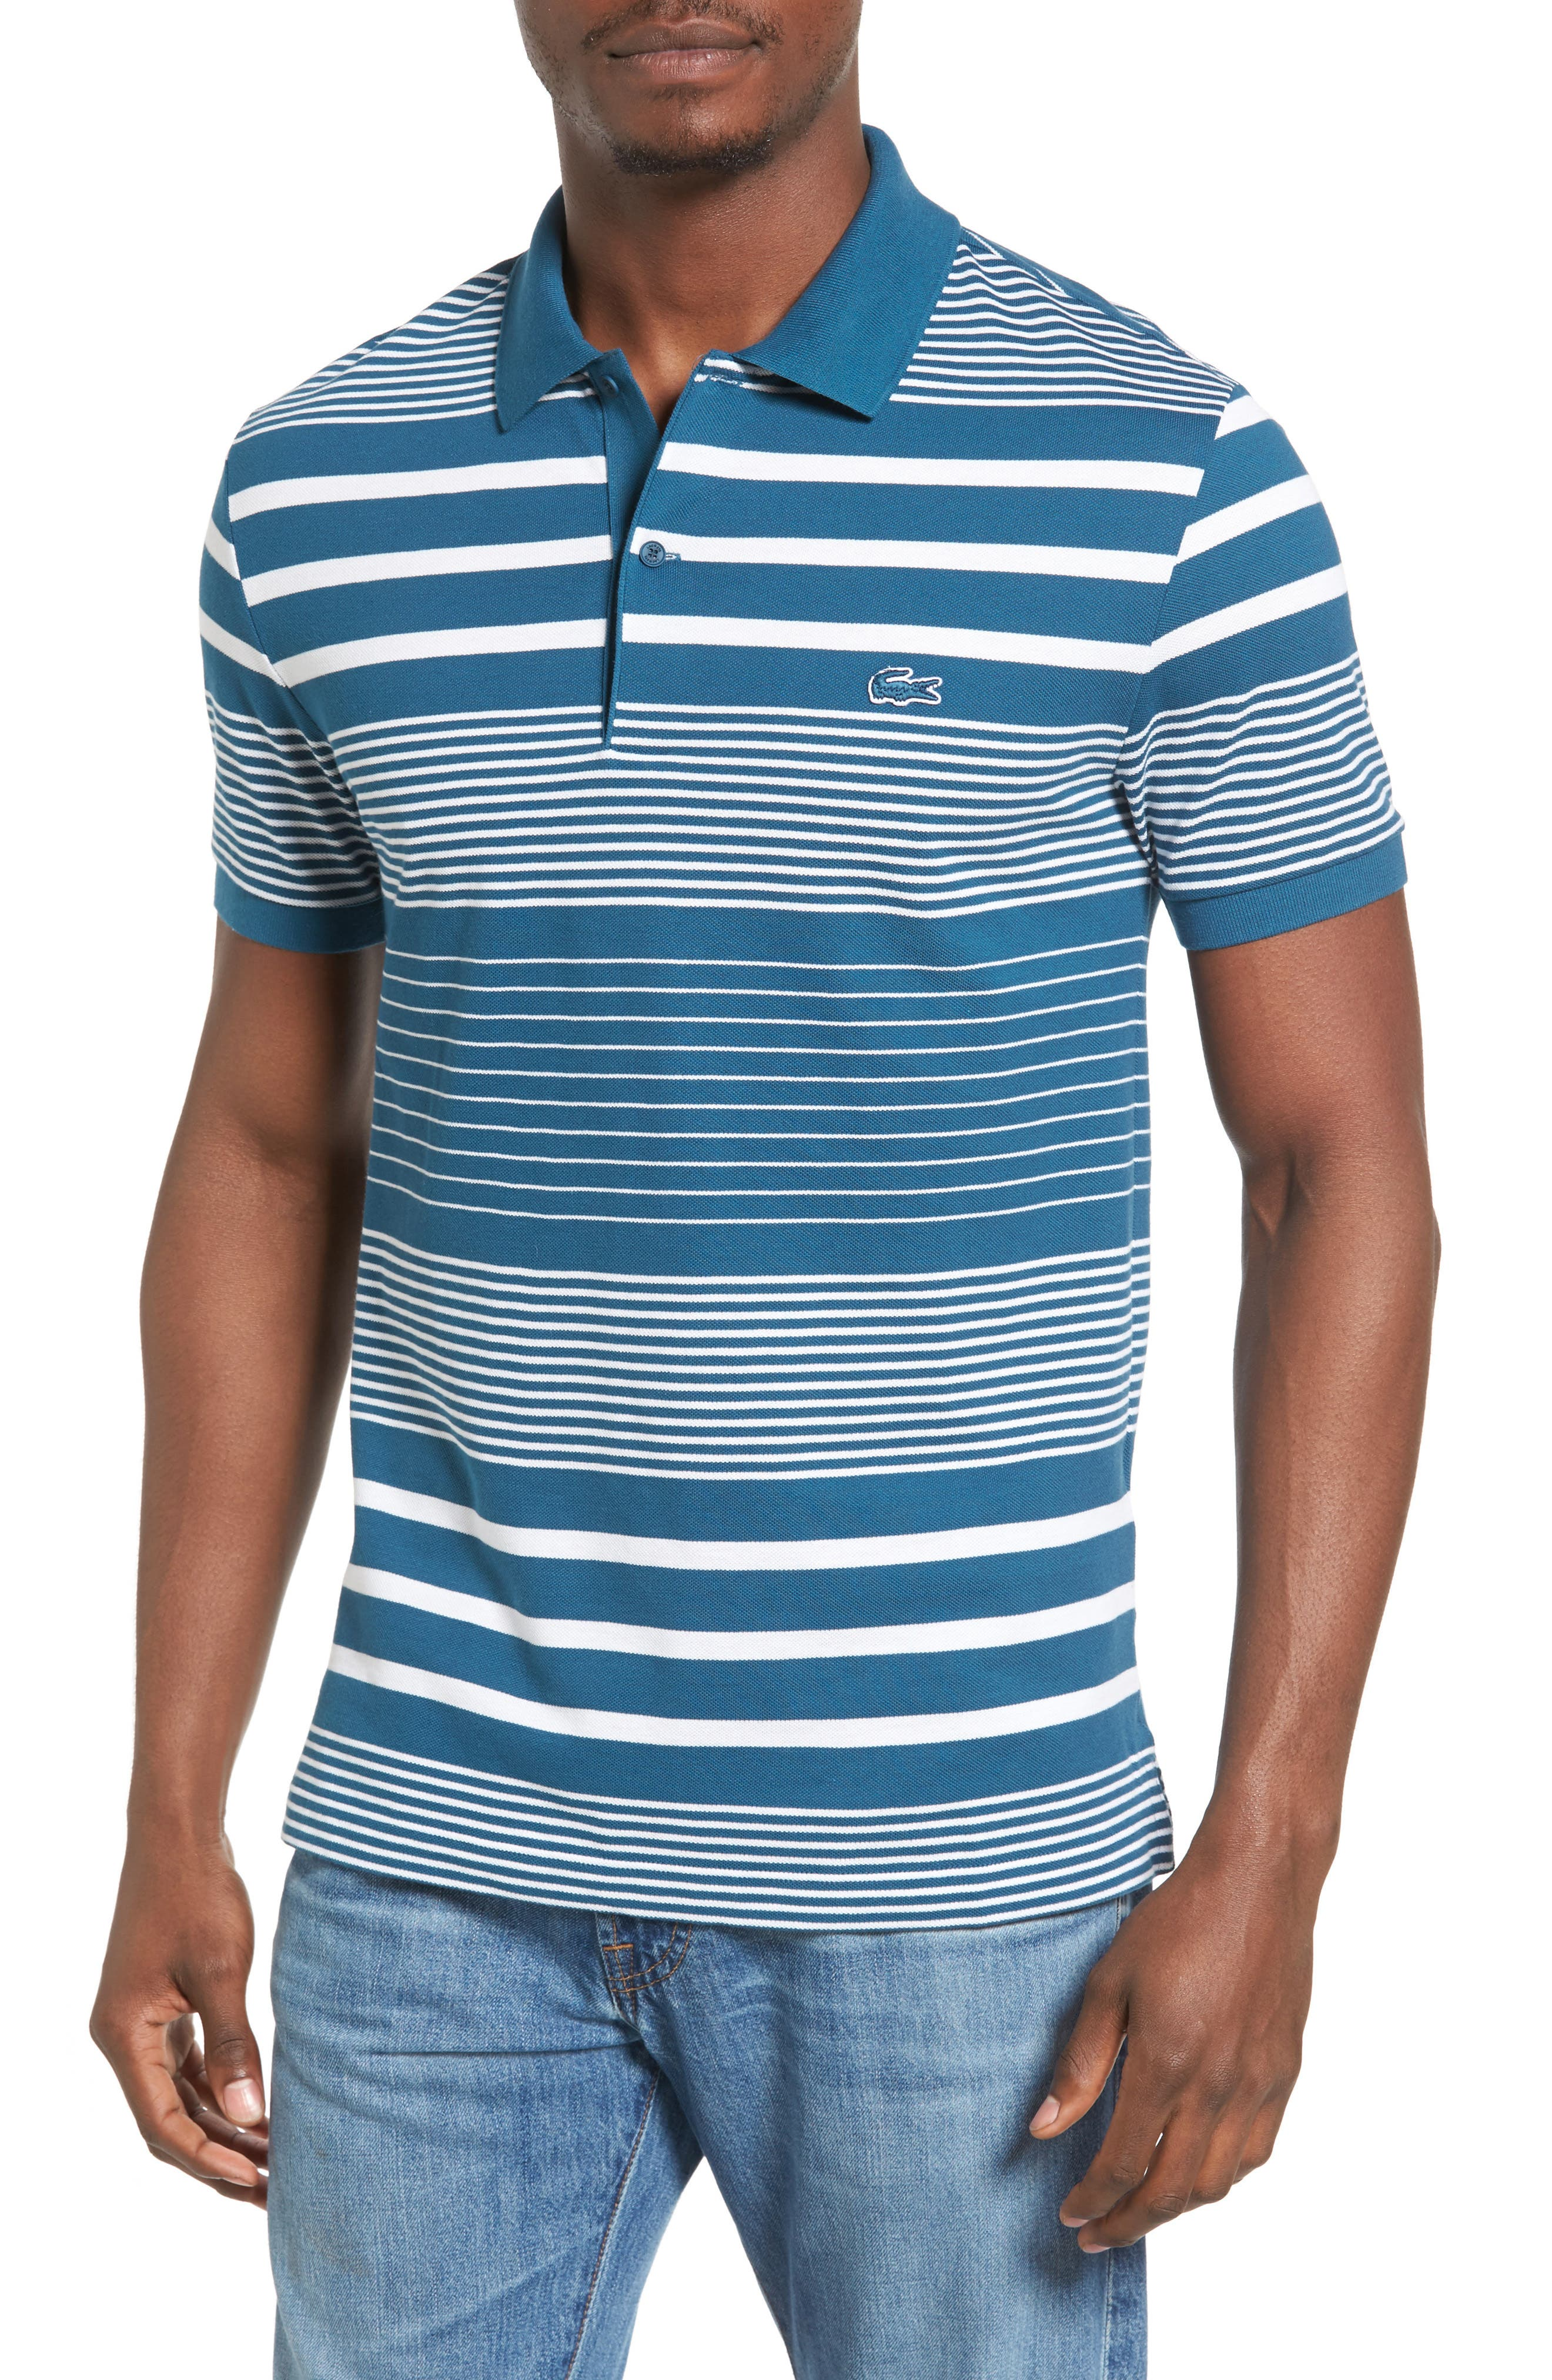 Alternate Image 1 Selected - Lacoste Stripe Piqué Polo